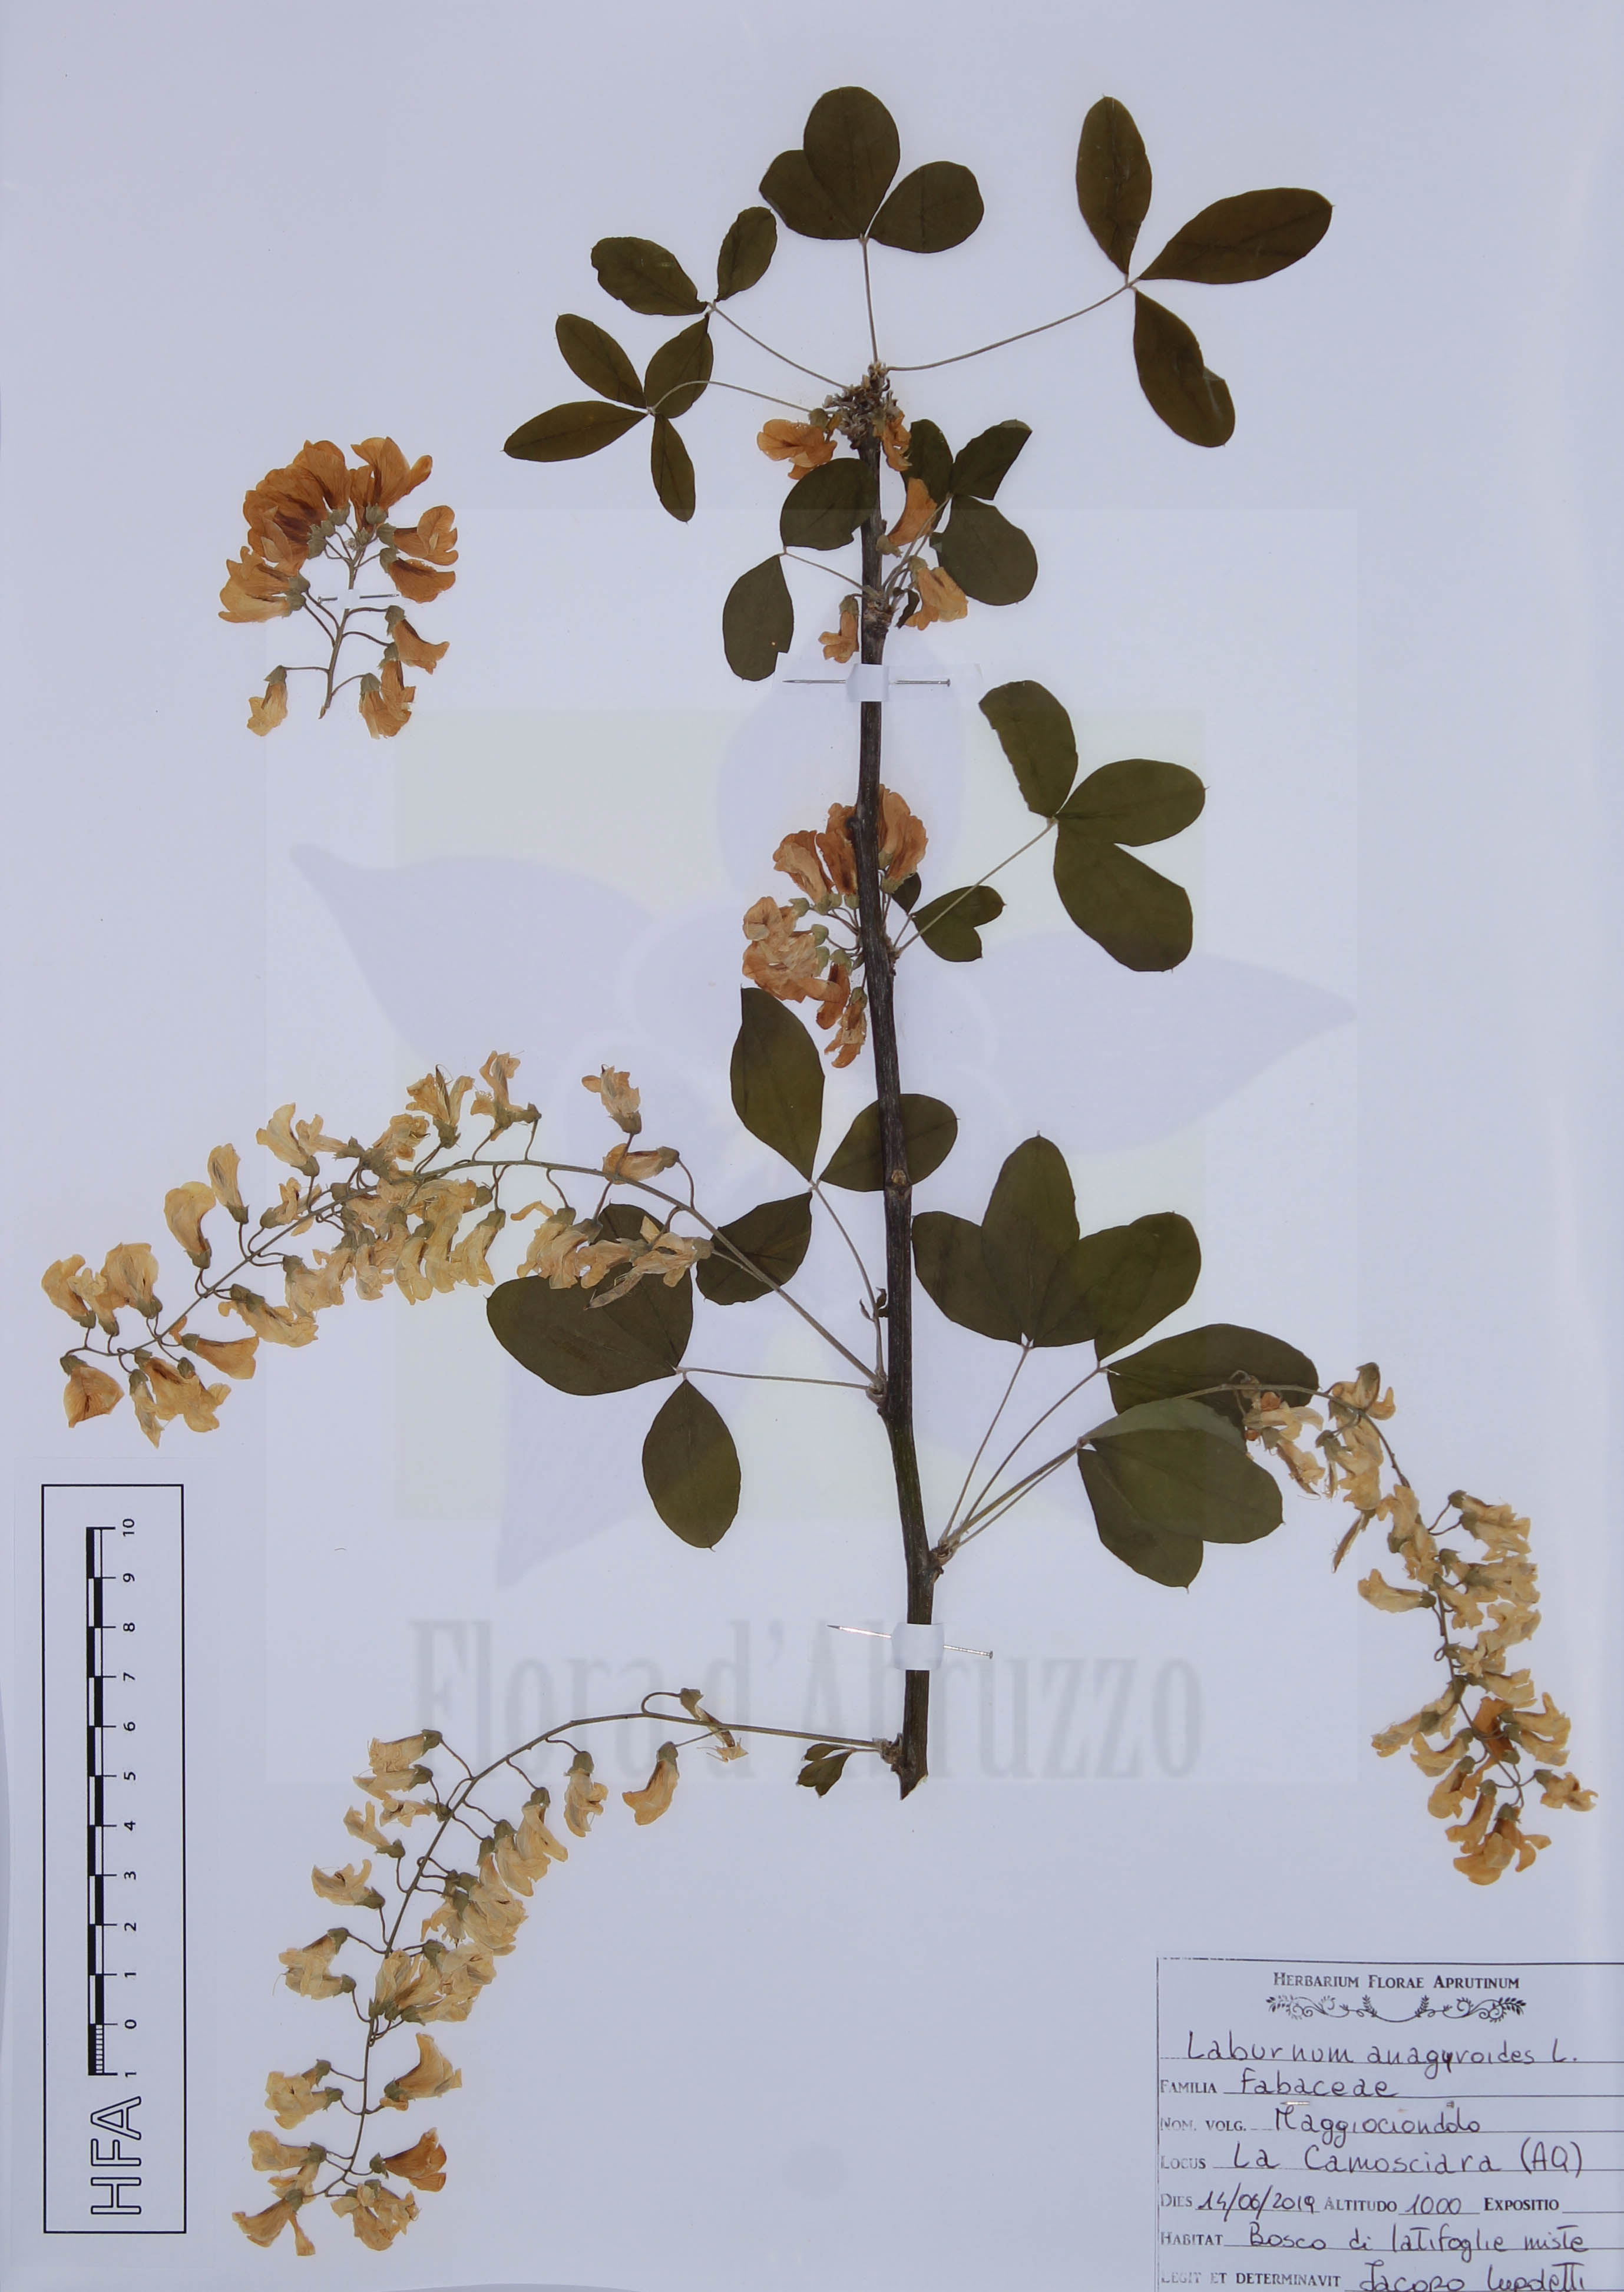 Laburnum anagyroides L.